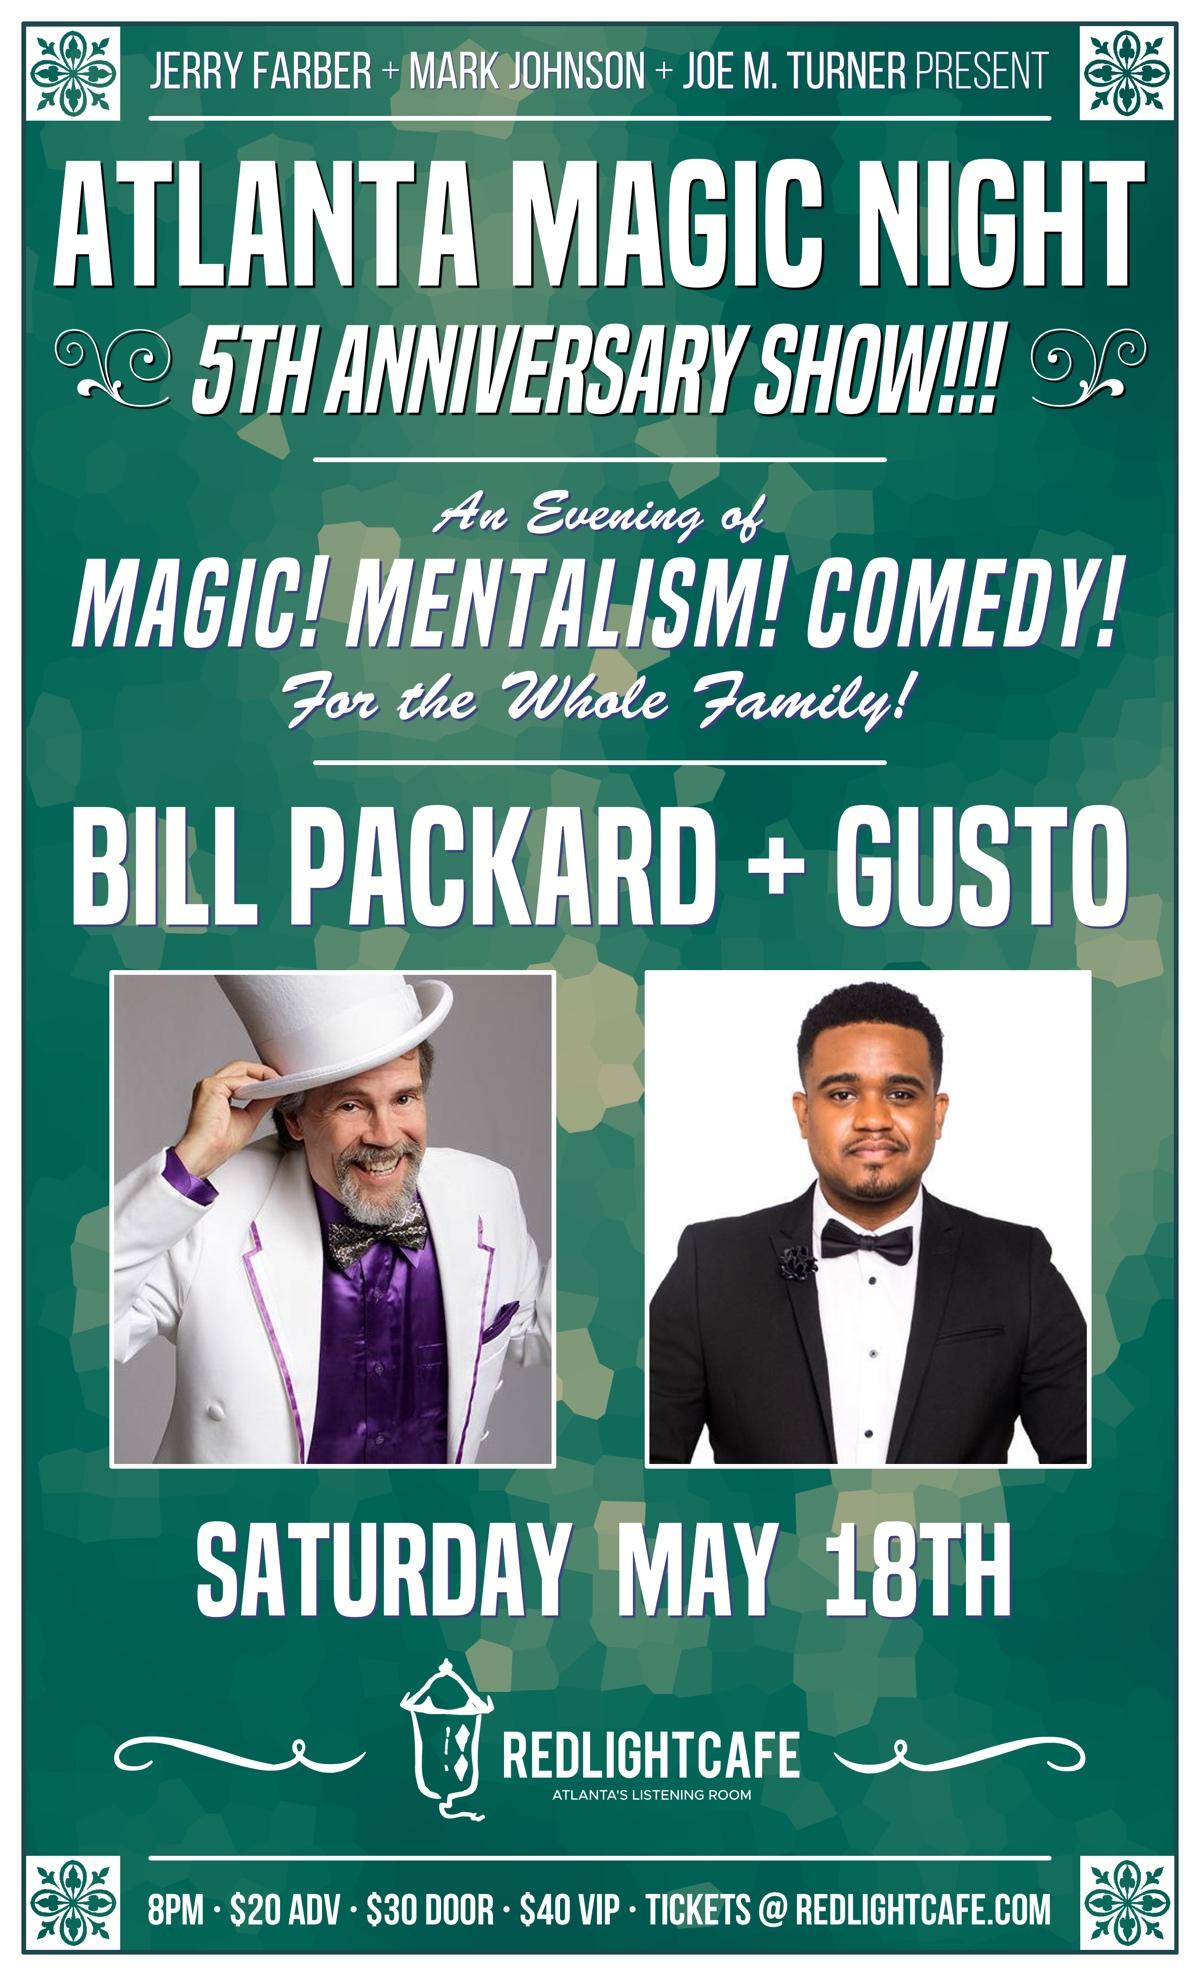 Atlanta Magic Night! 5th Anniversary Show w/ Bill Packard + Gusto — May 18, 2019 — Red Light Café, Atlanta, GA